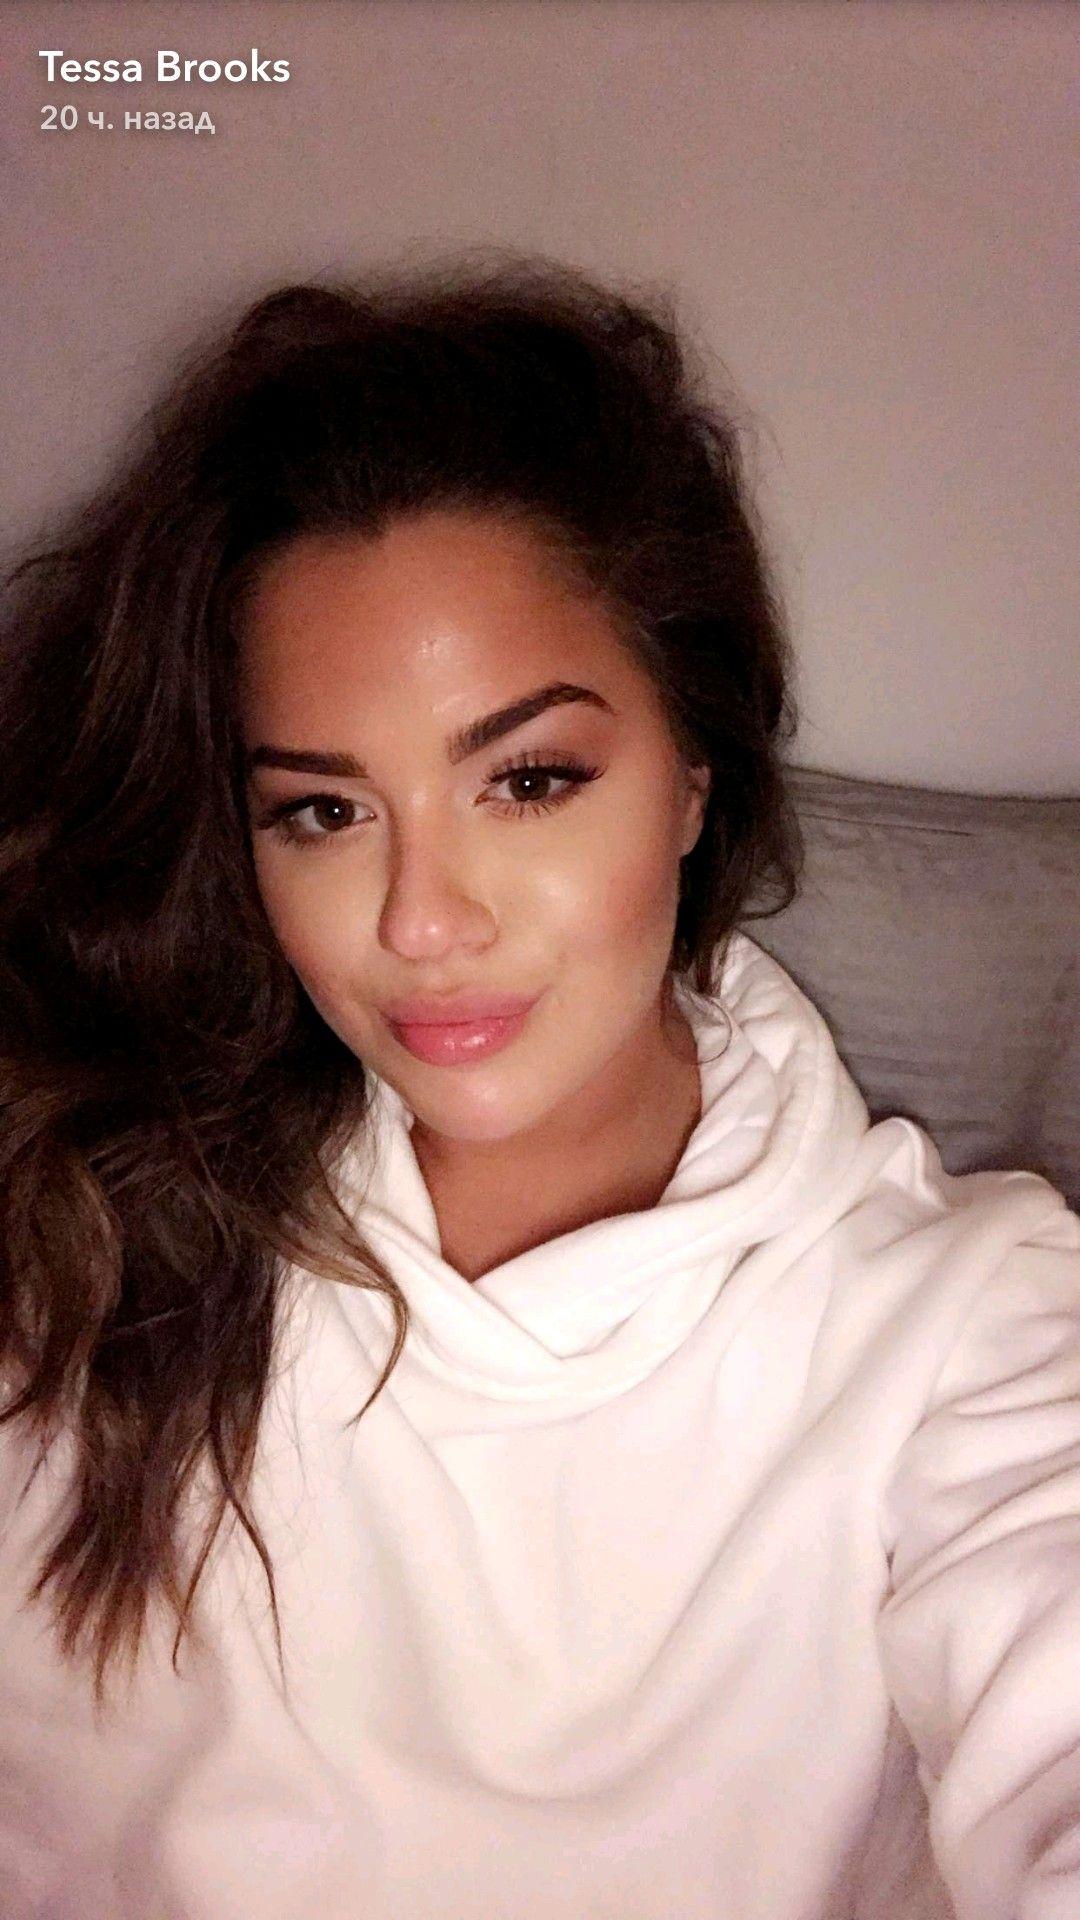 Snapchat Tessa Brooks nude photos 2019